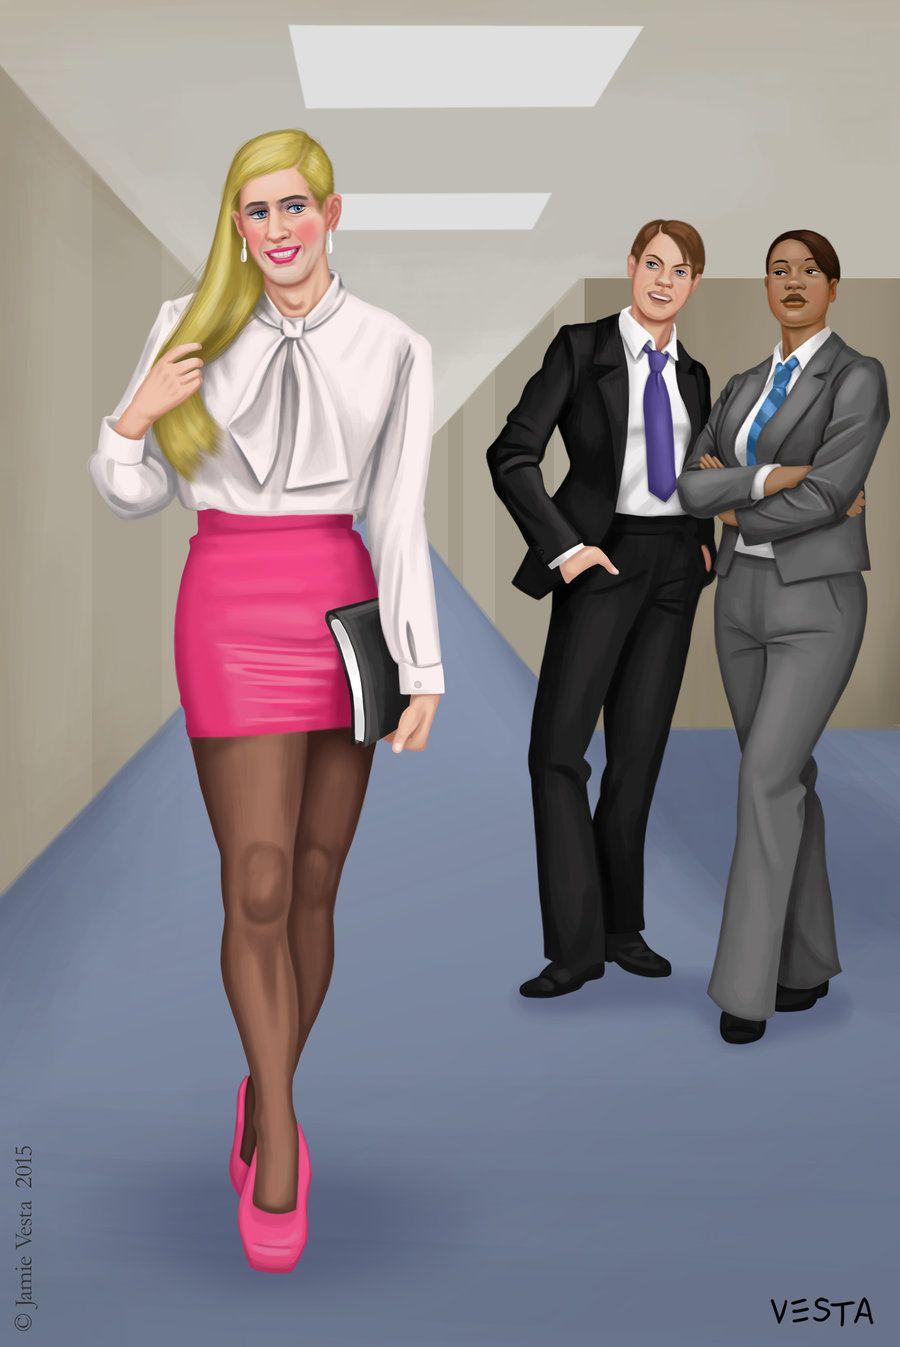 cartoon over Secretary bending